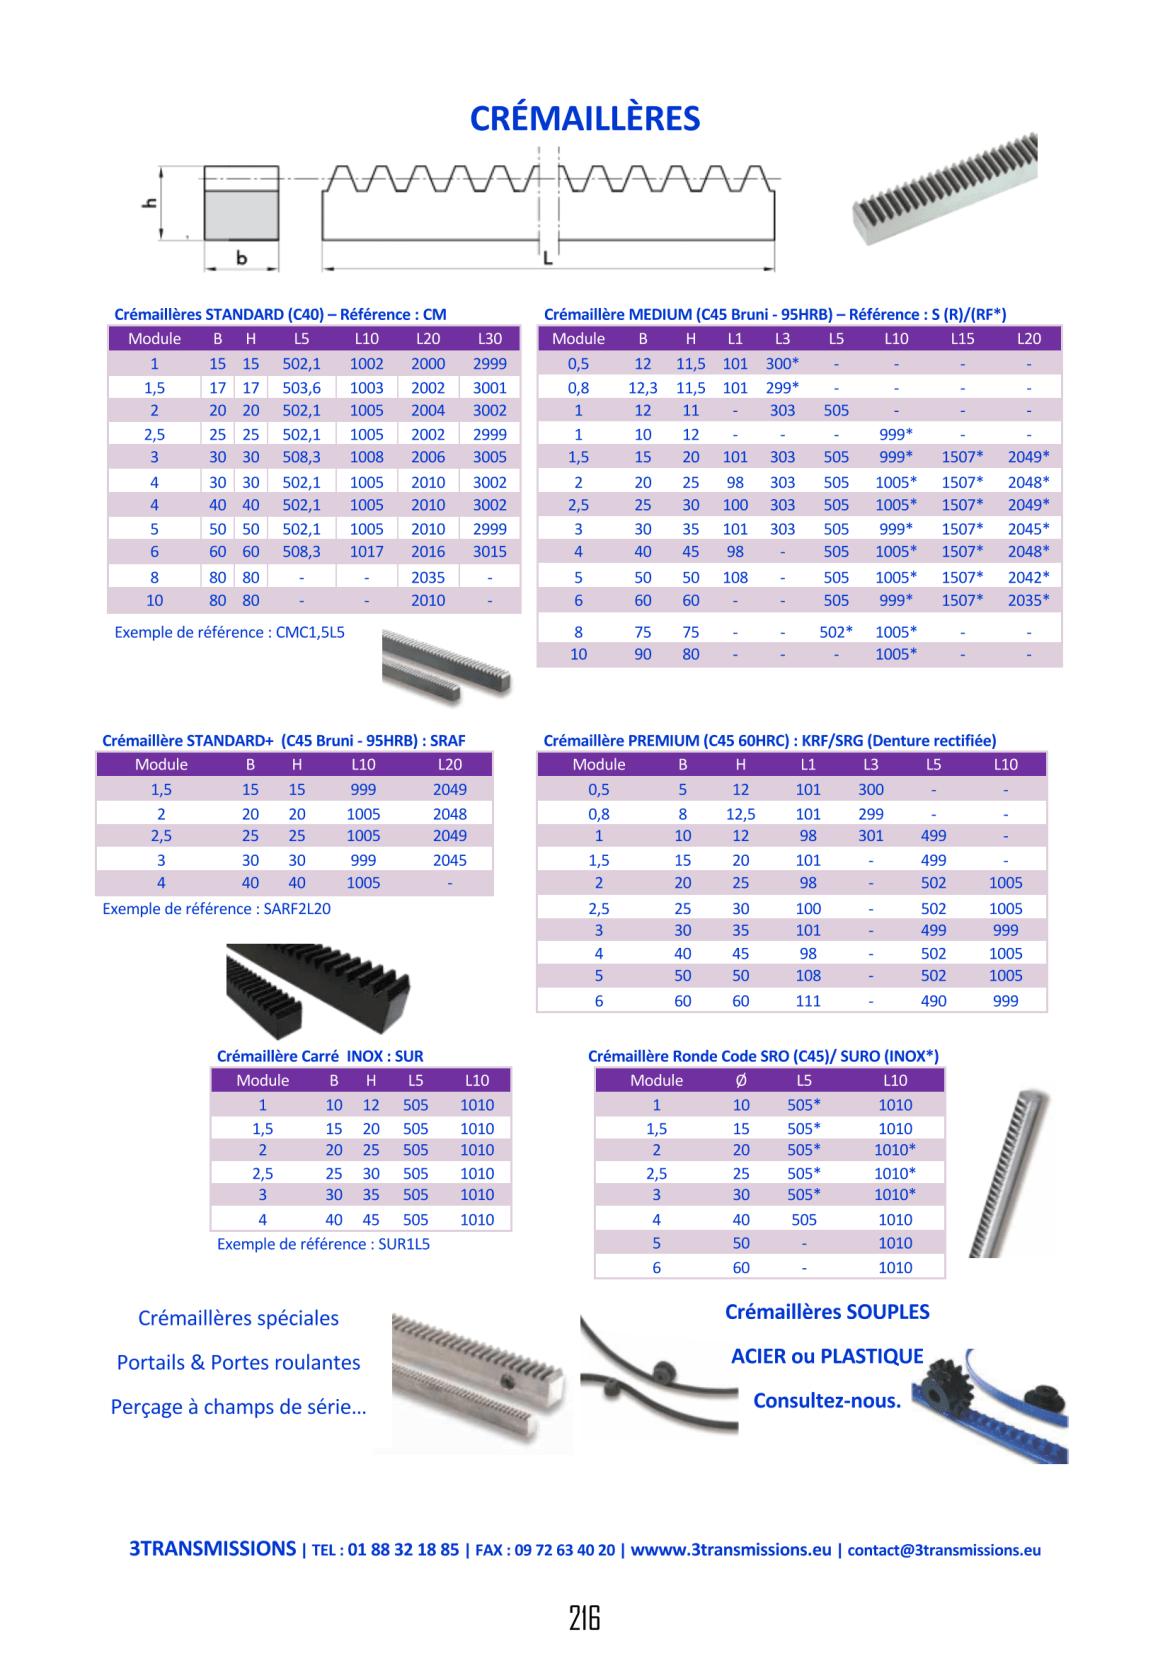 Catalogue 3Transmissions - Crémaillères acier, Crémaillères Inox